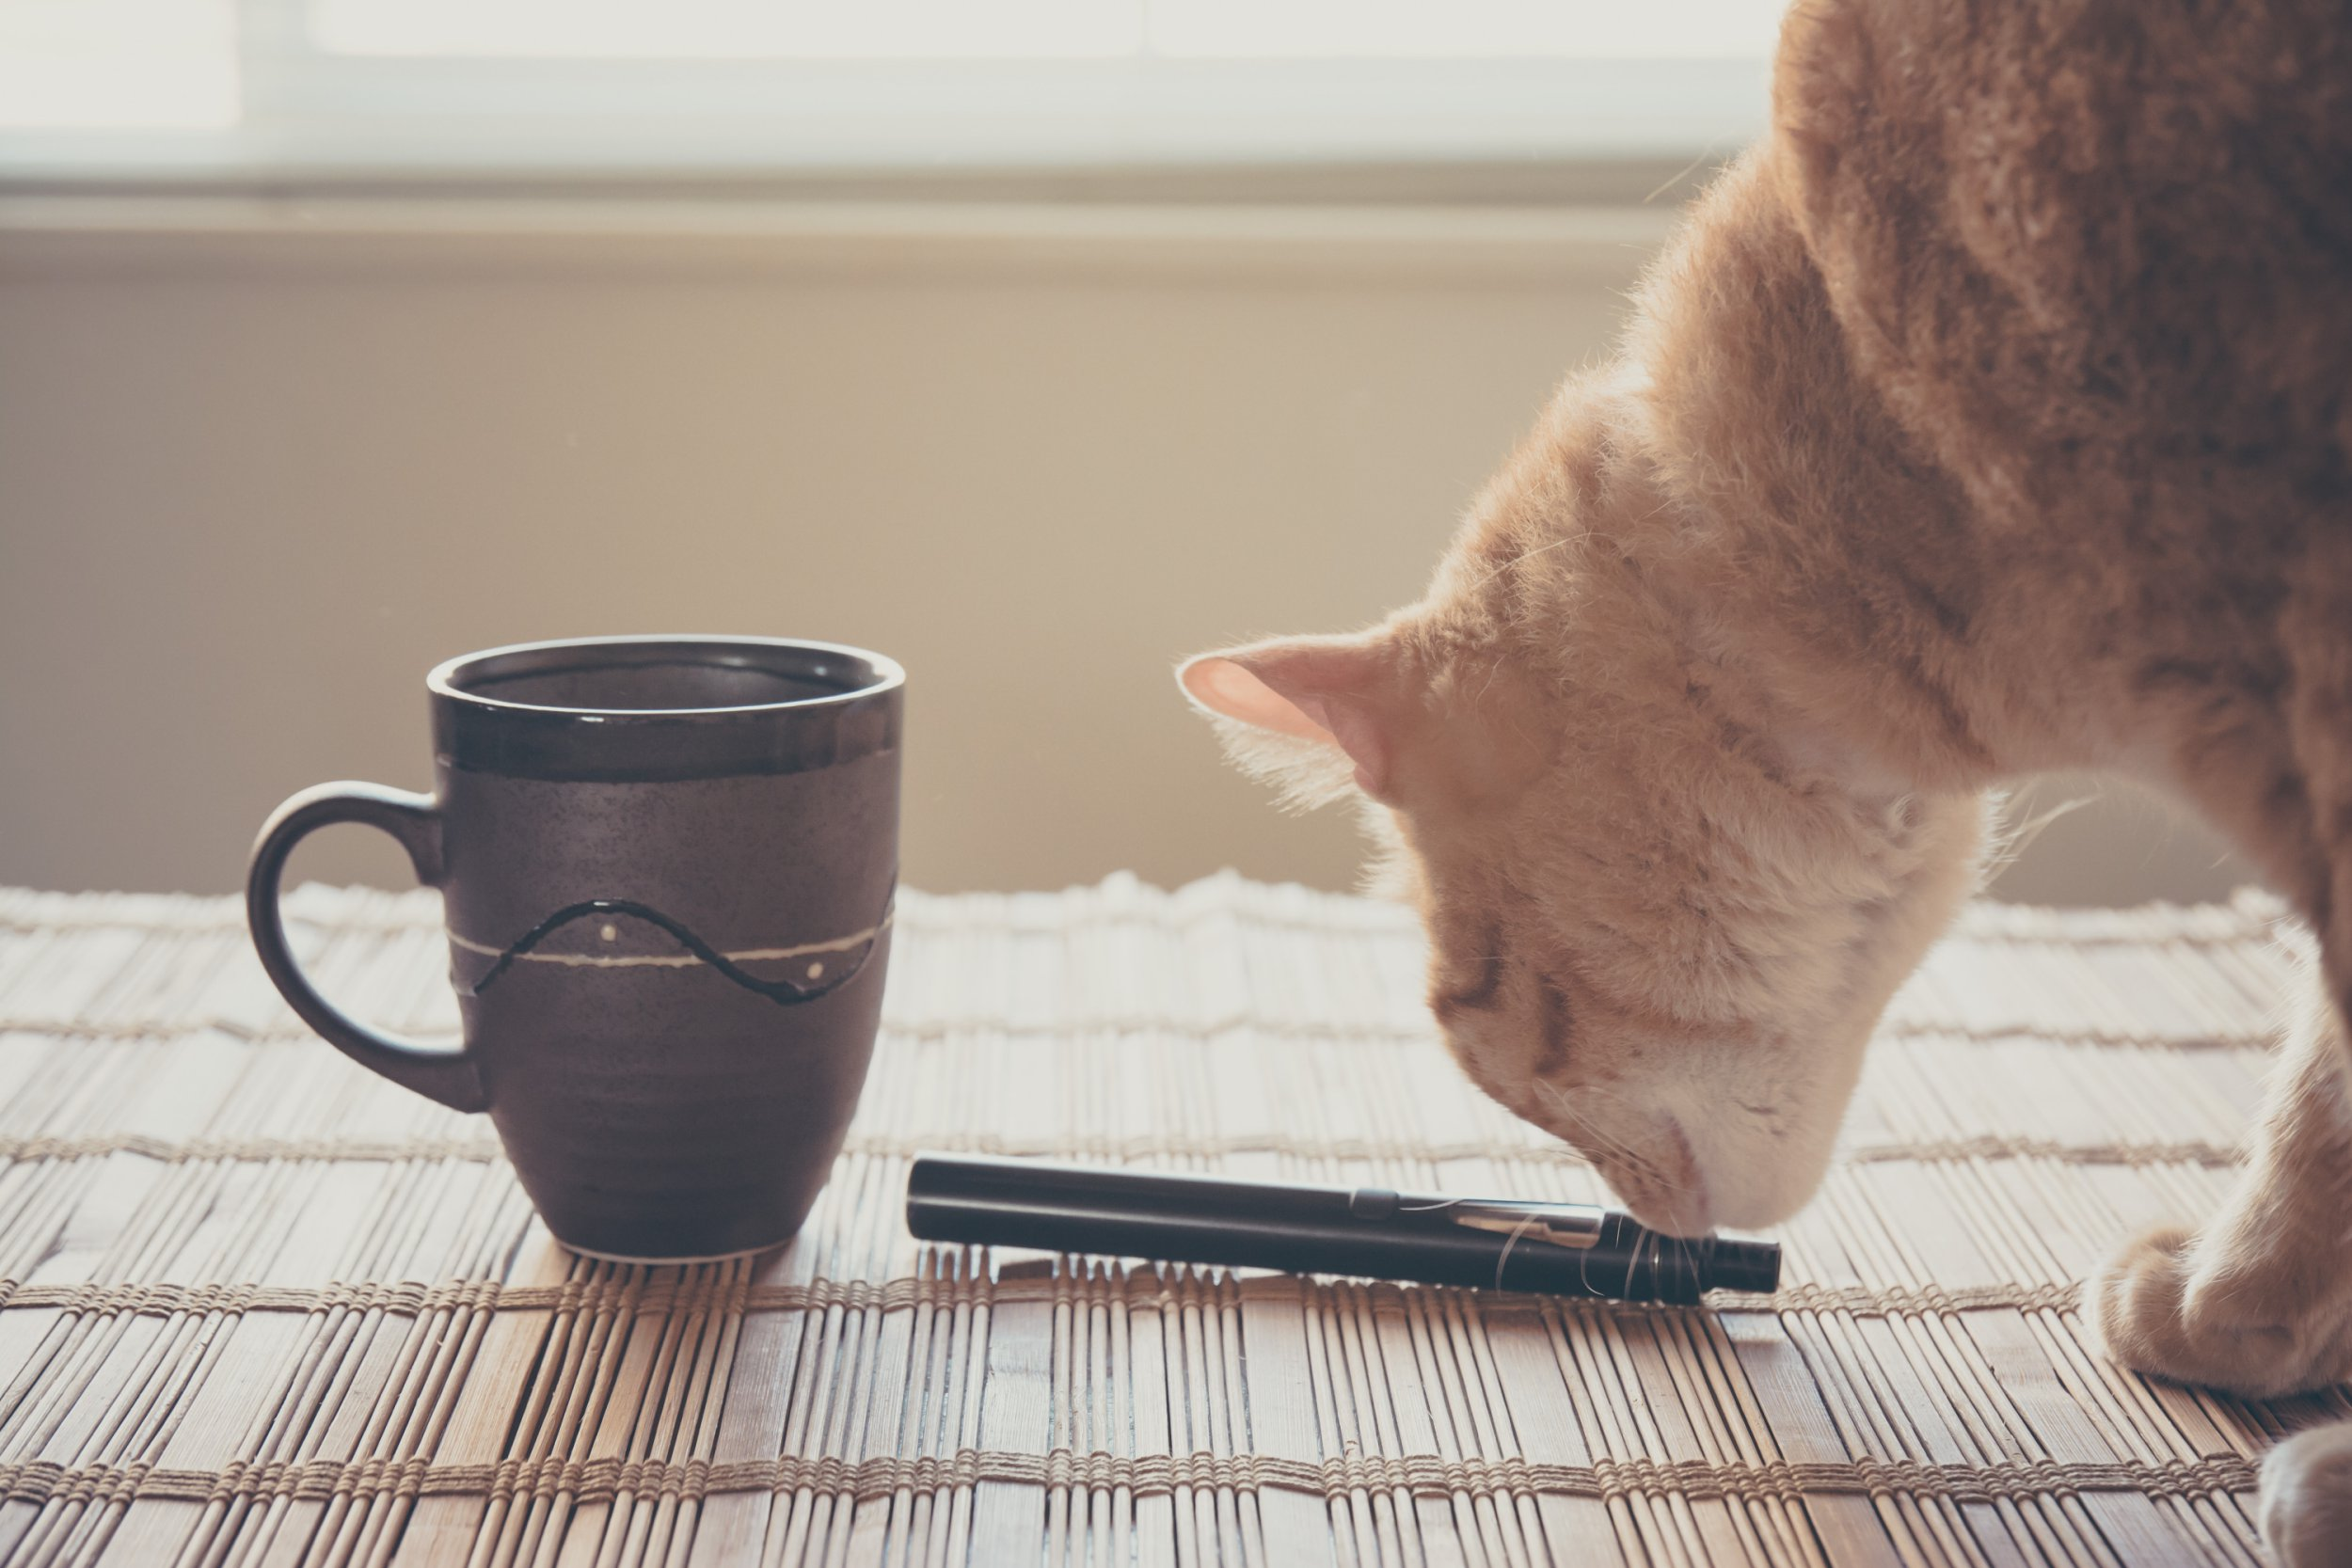 Vaping 101: Can you vape around your pets?